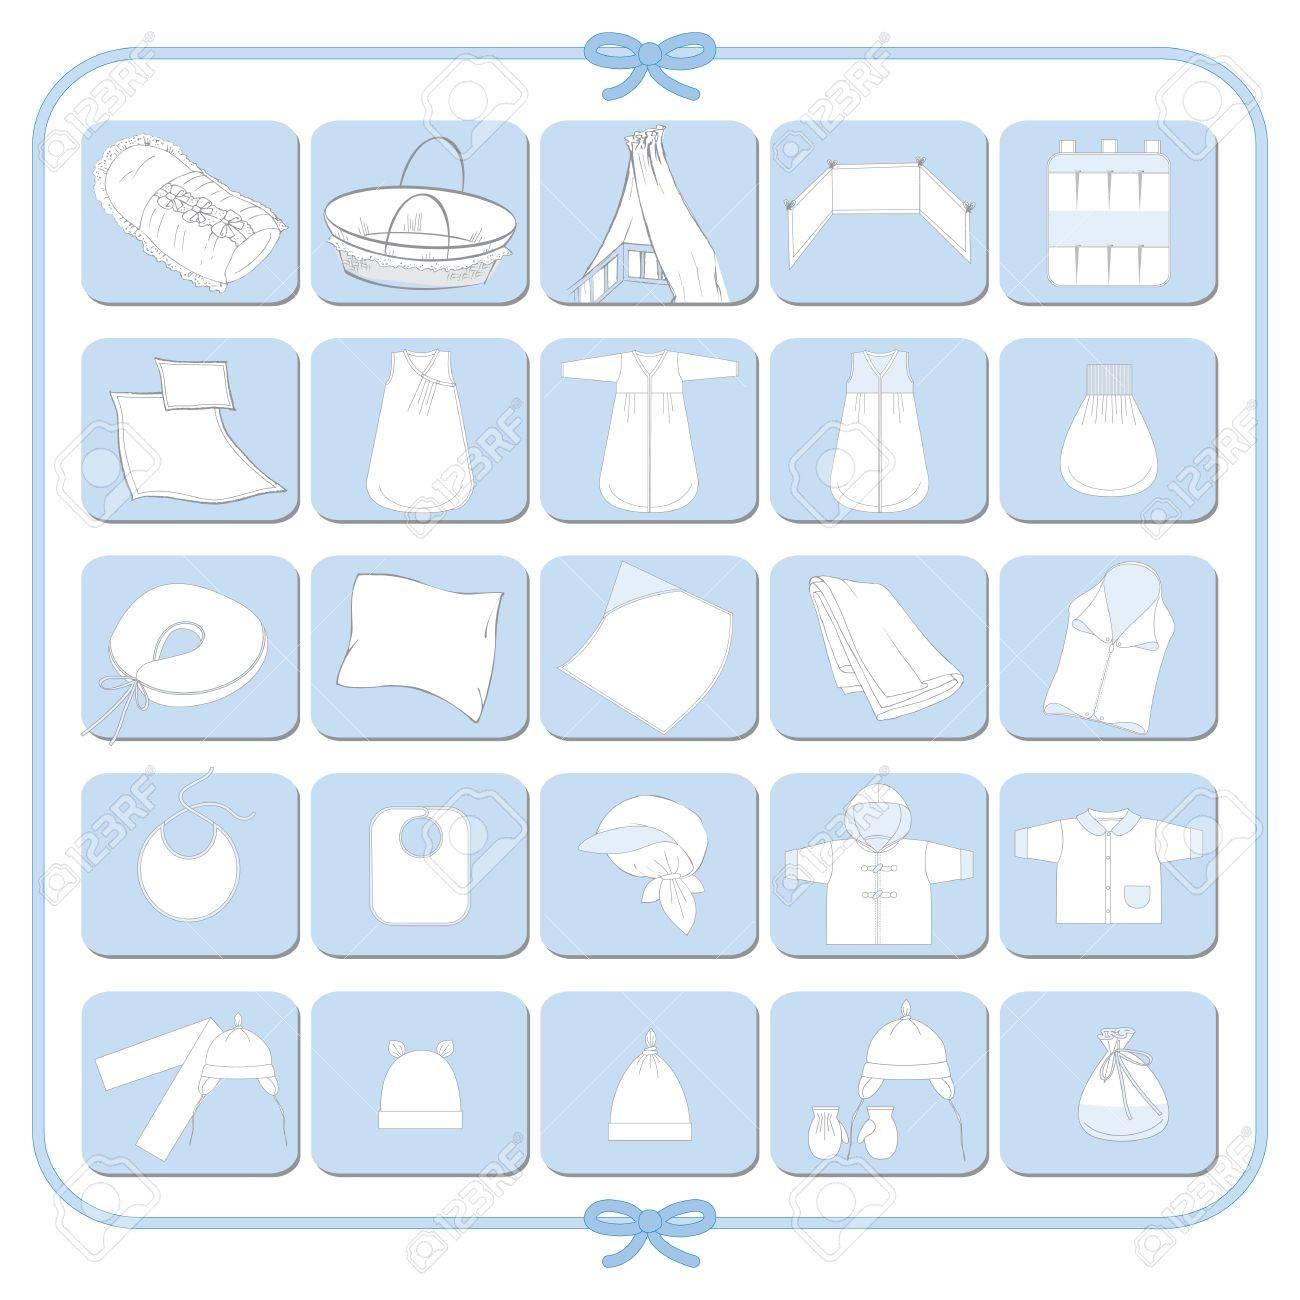 Pictograms of white babyboy dresses - 14410190